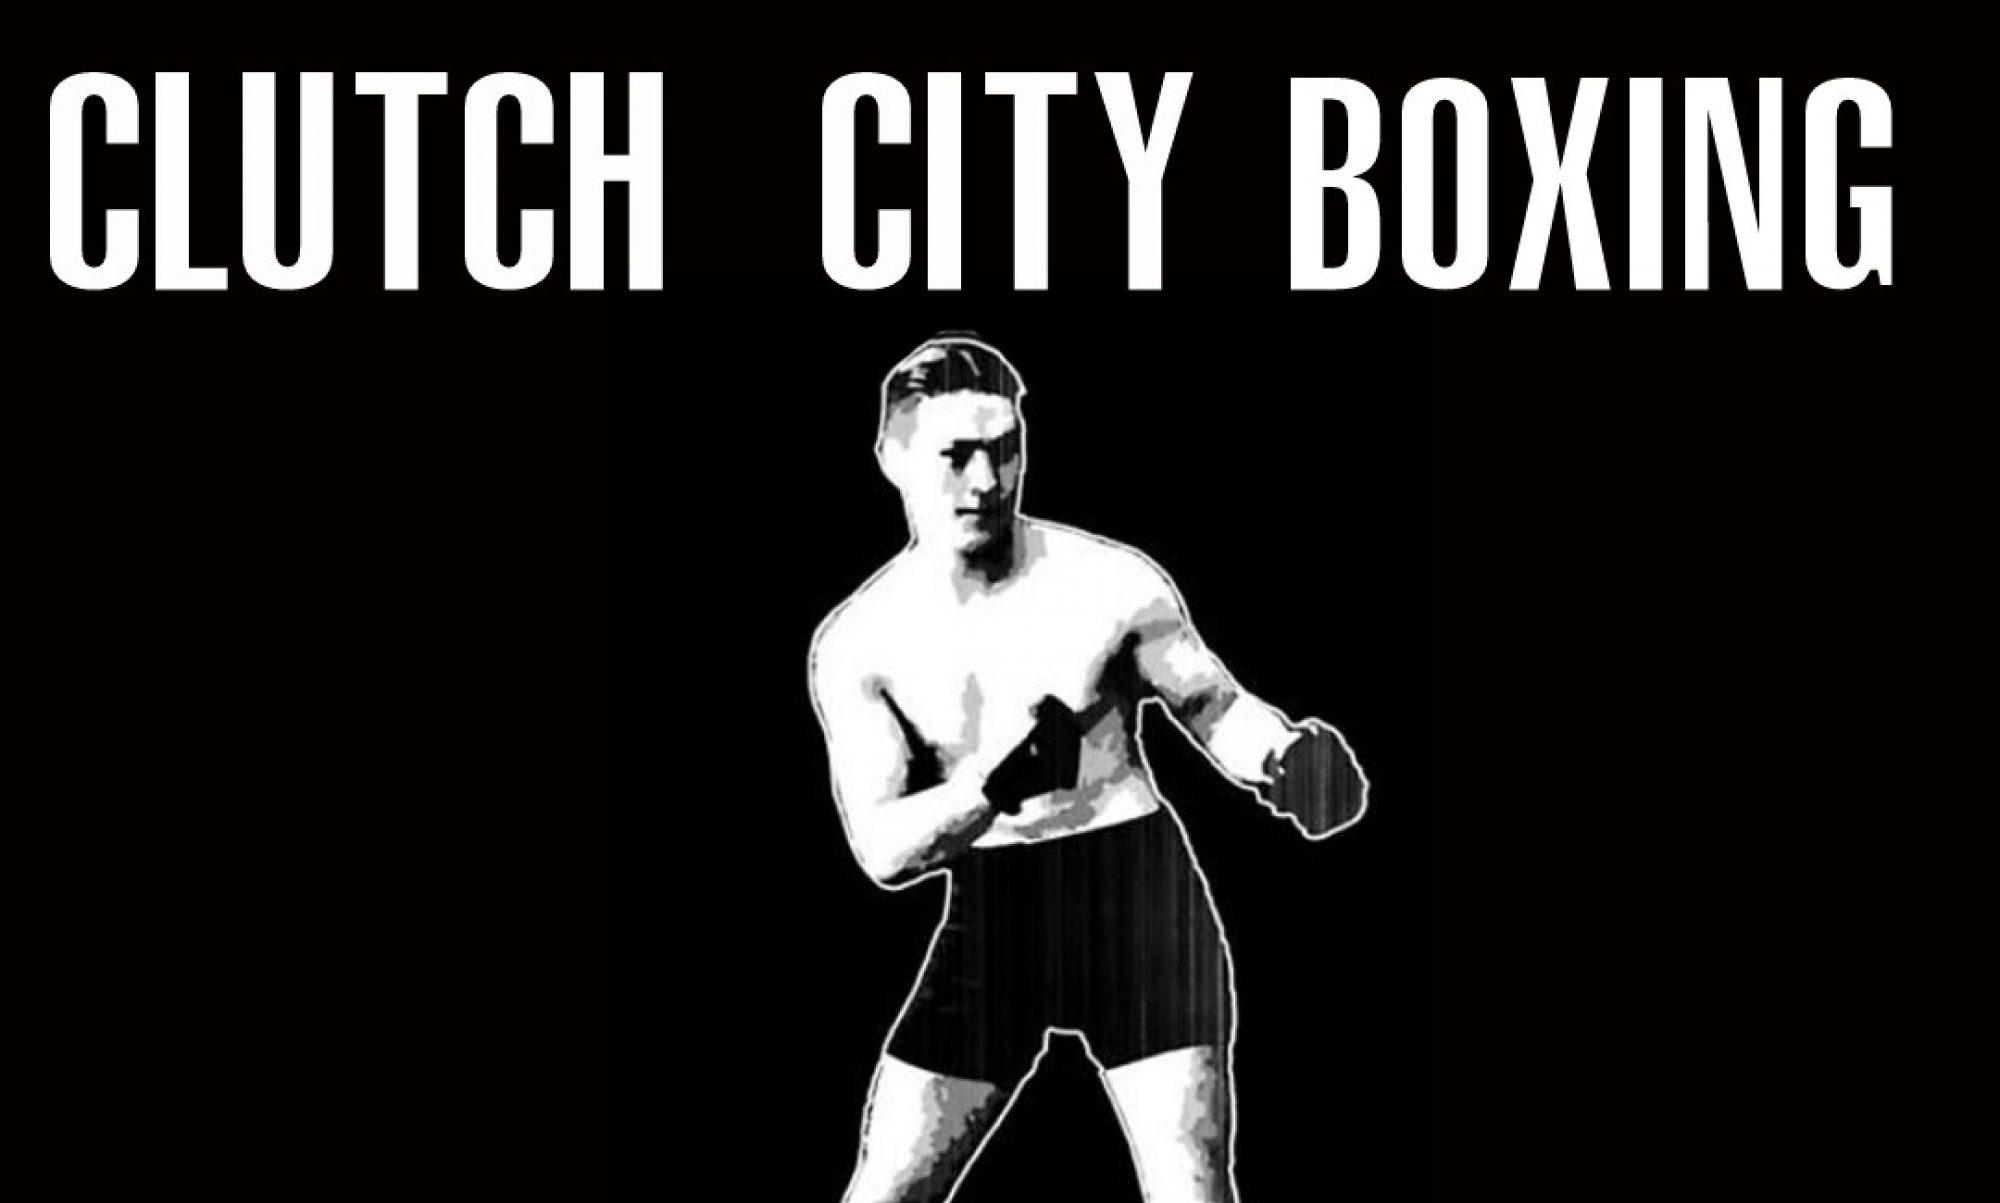 Boxing Legends – Clutch City Boxing